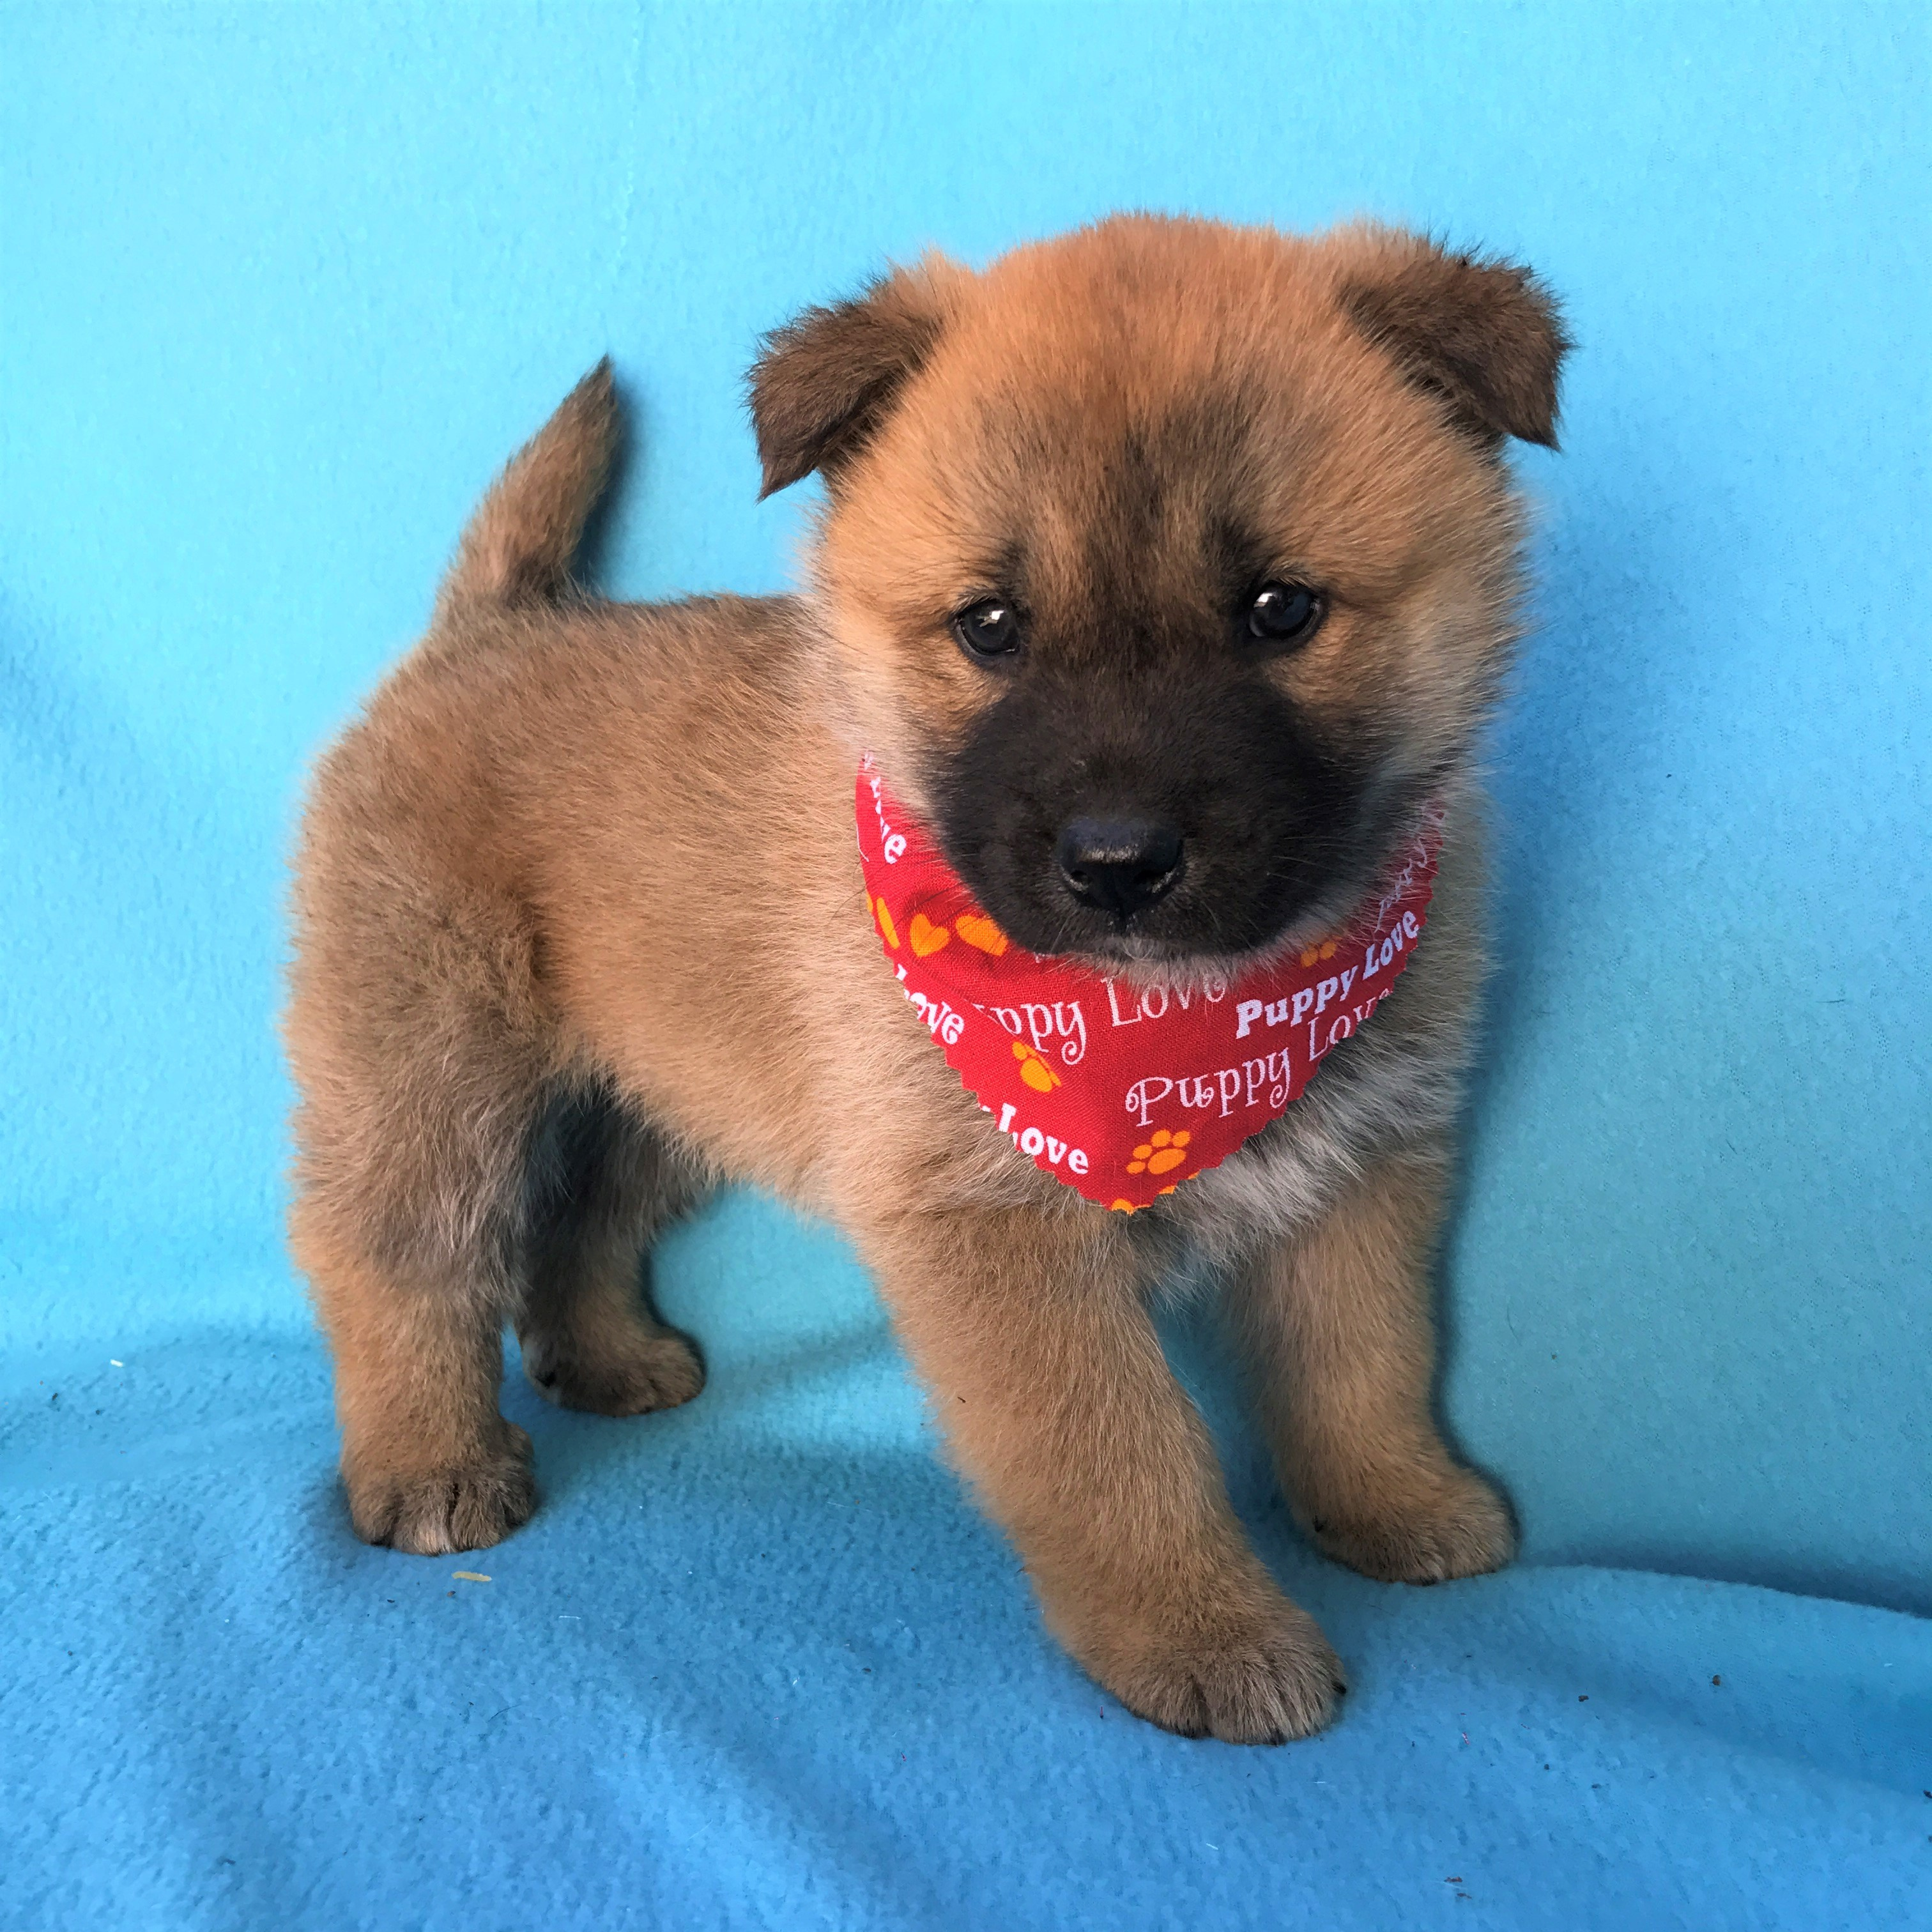 Burbank Ca Jindo Meet Hachiko 981 020 019 772 990 A Pet For Adoption